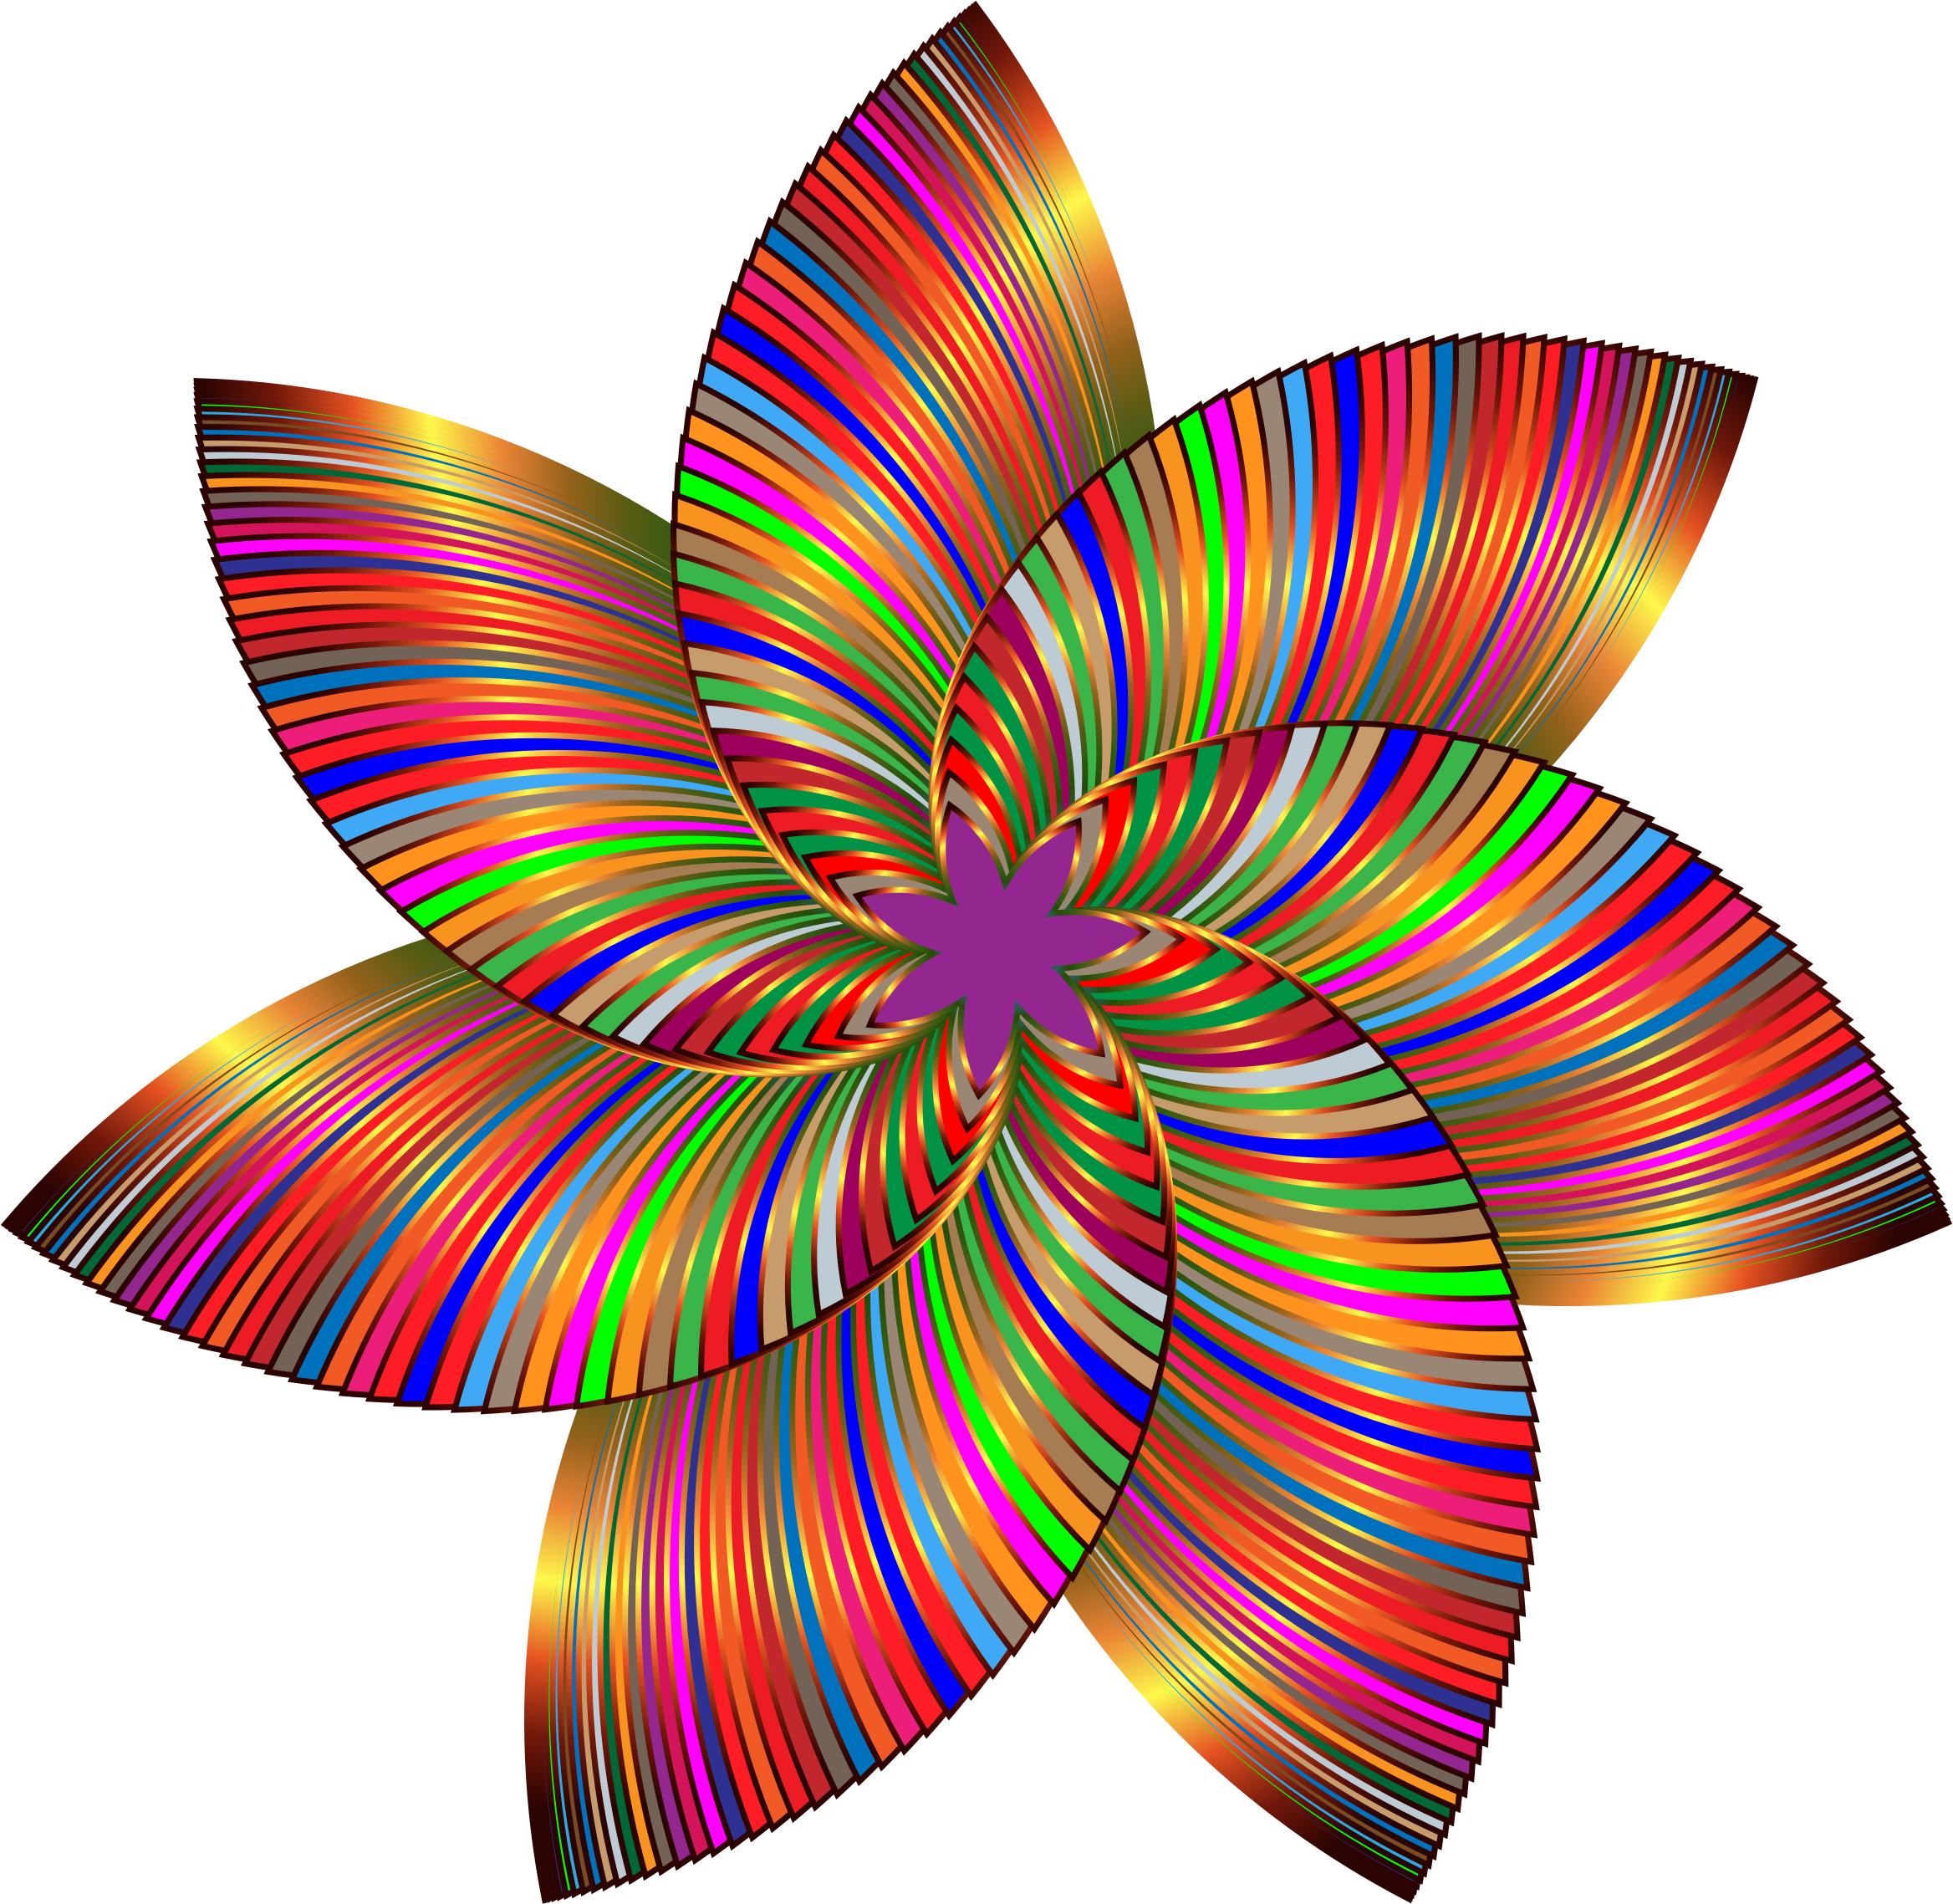 Geometric flower clipart image stock Clipart - Colorful Flower Line Art 3 image stock